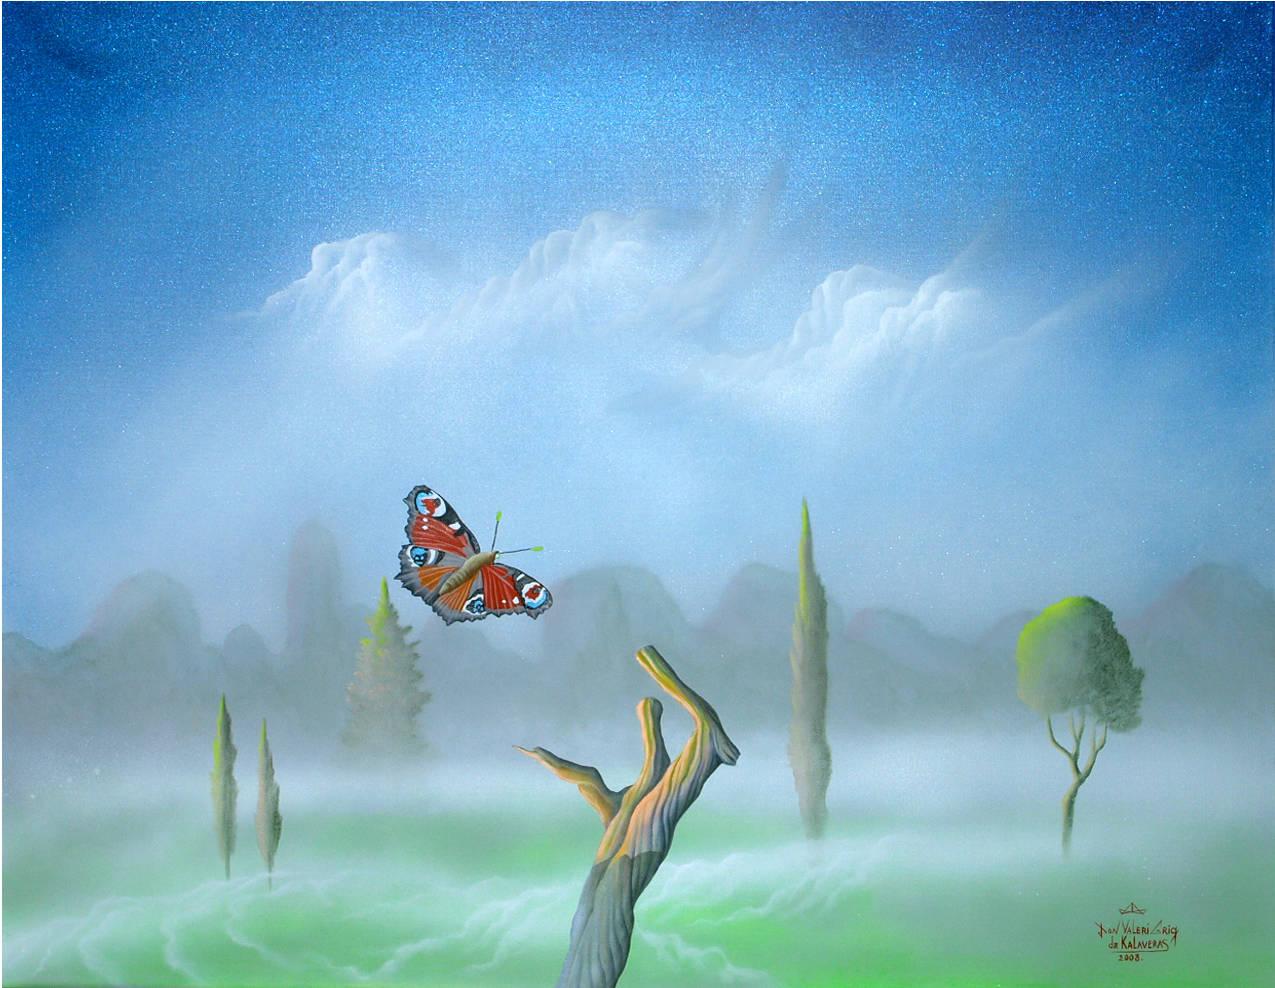 """Утренний туман. Из серии картин Эстонские туманы."" Пейзаж, холст, масло, размер: 60см х 80см. 2008. ПОСТМОДЕРН."